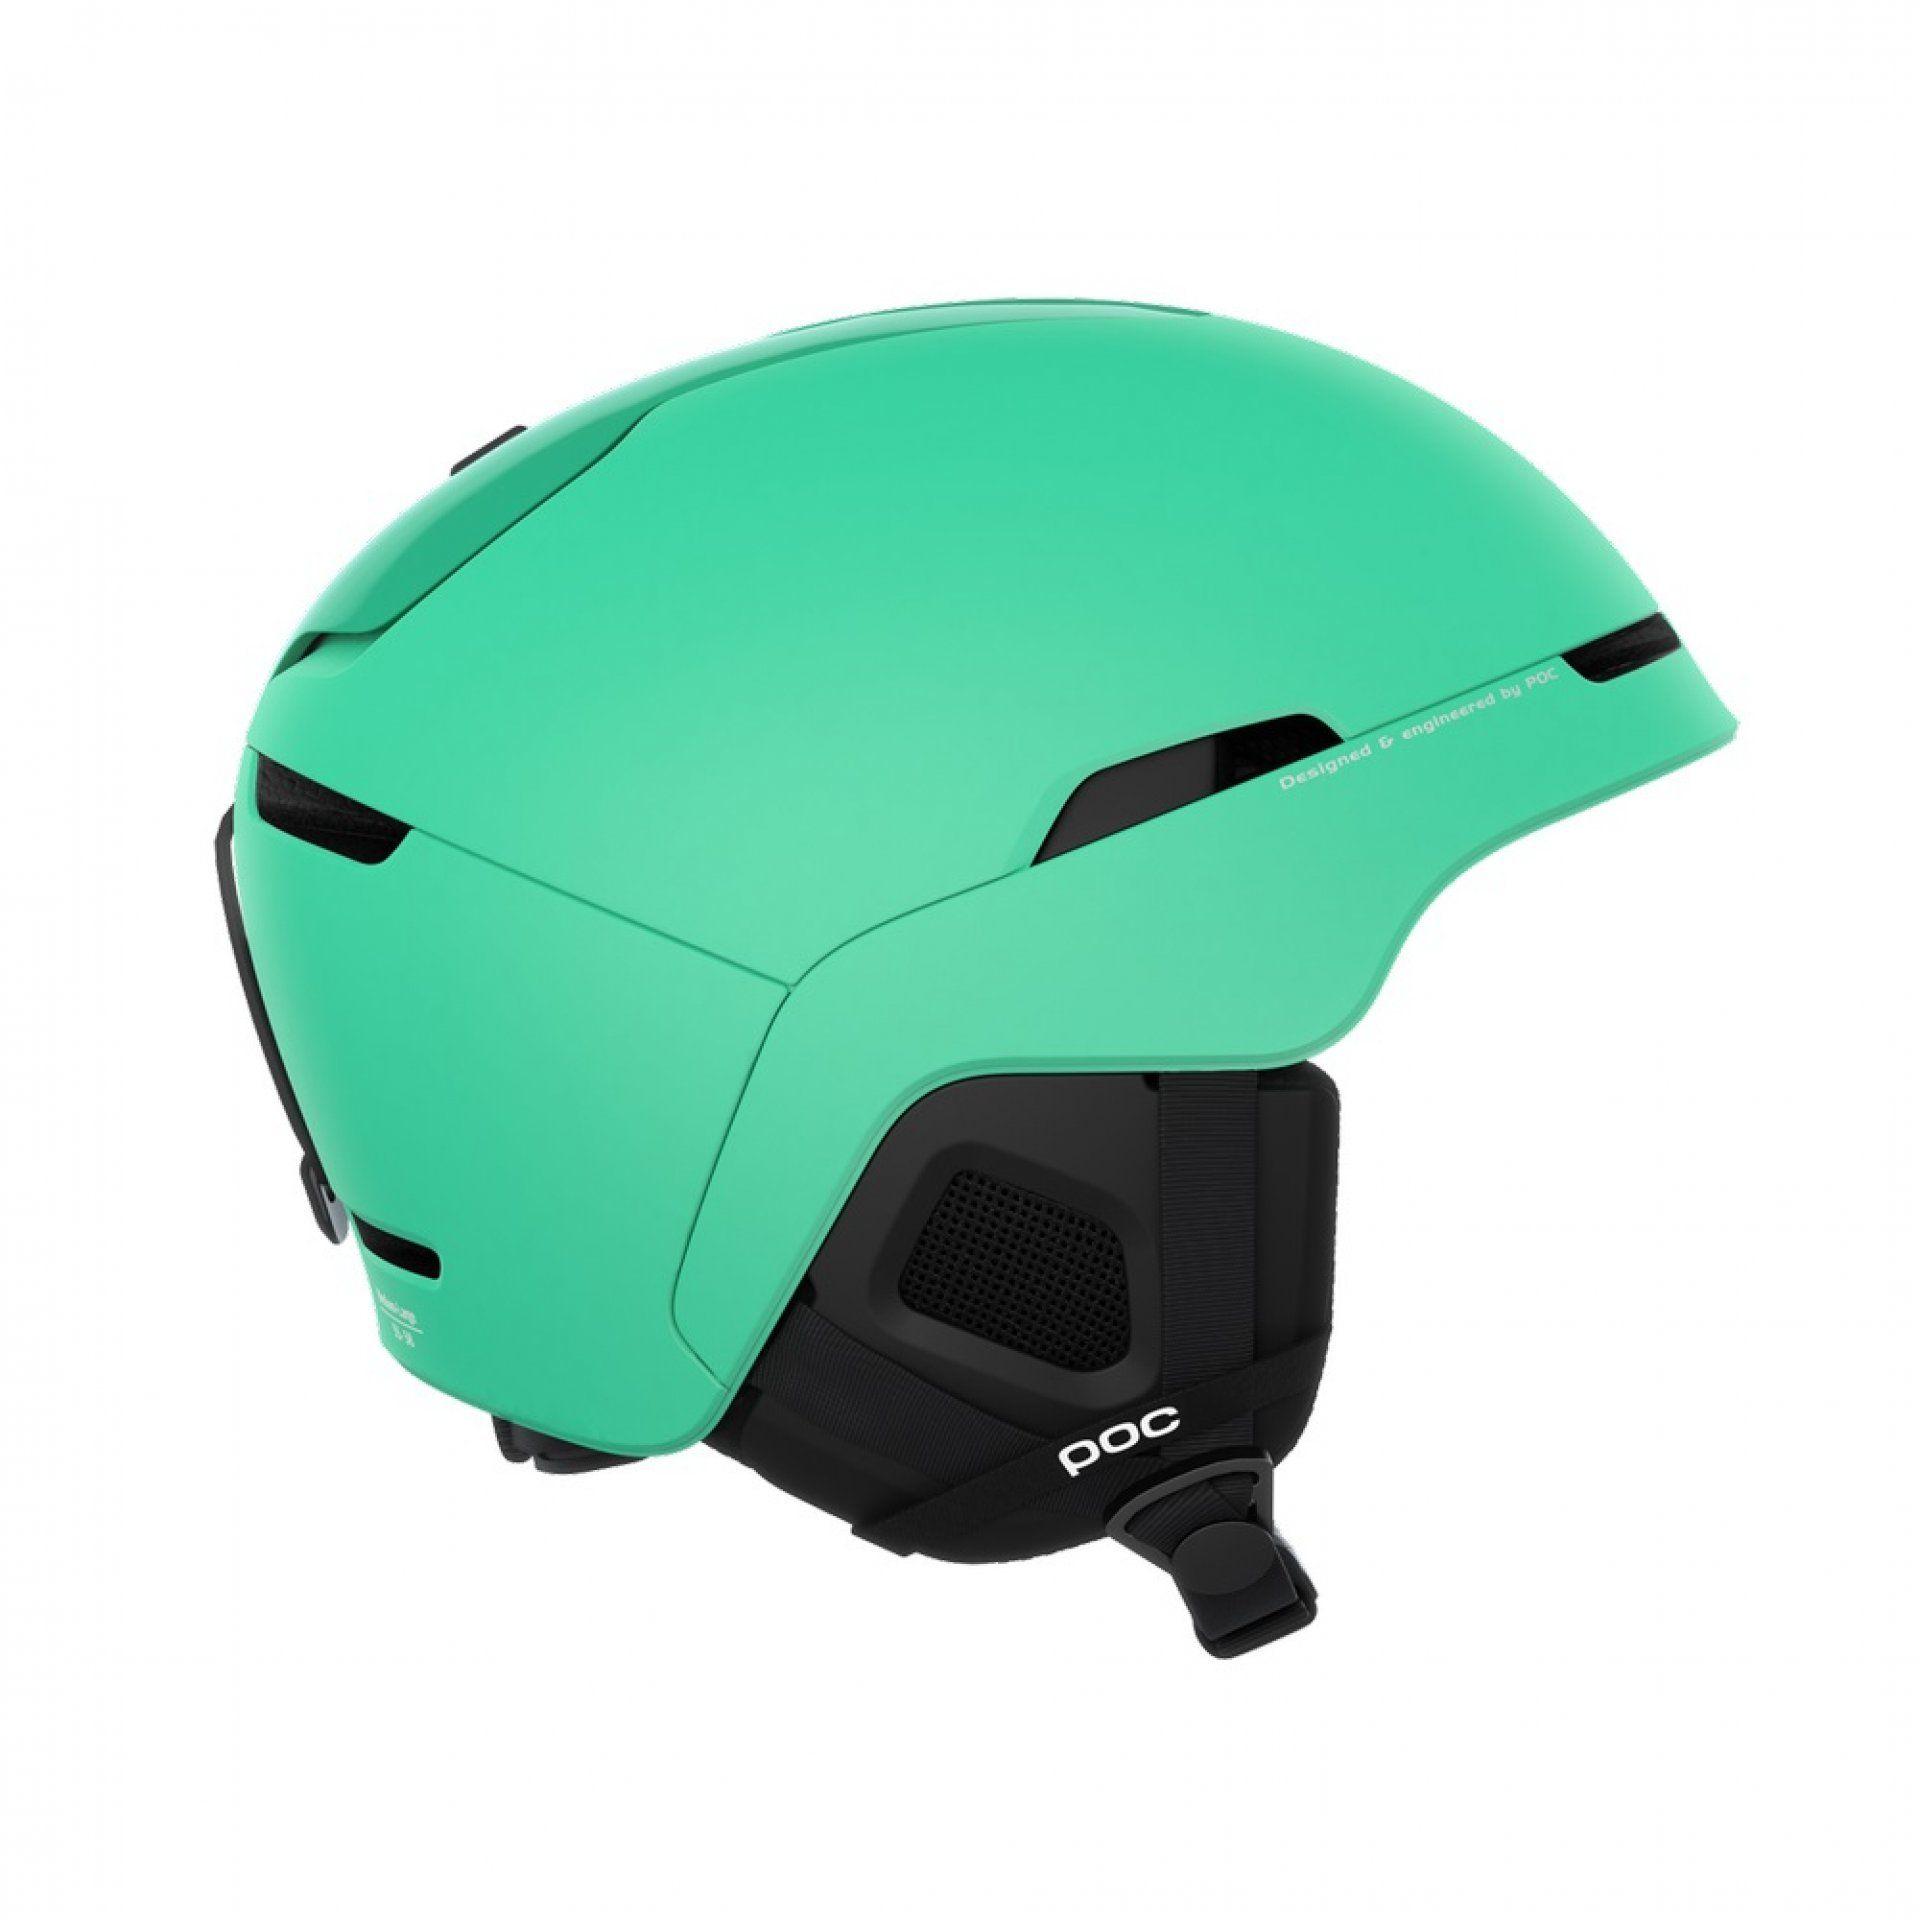 KASK POC OBEX SPIN 10103 1437 FLUORITE GREEN BOK